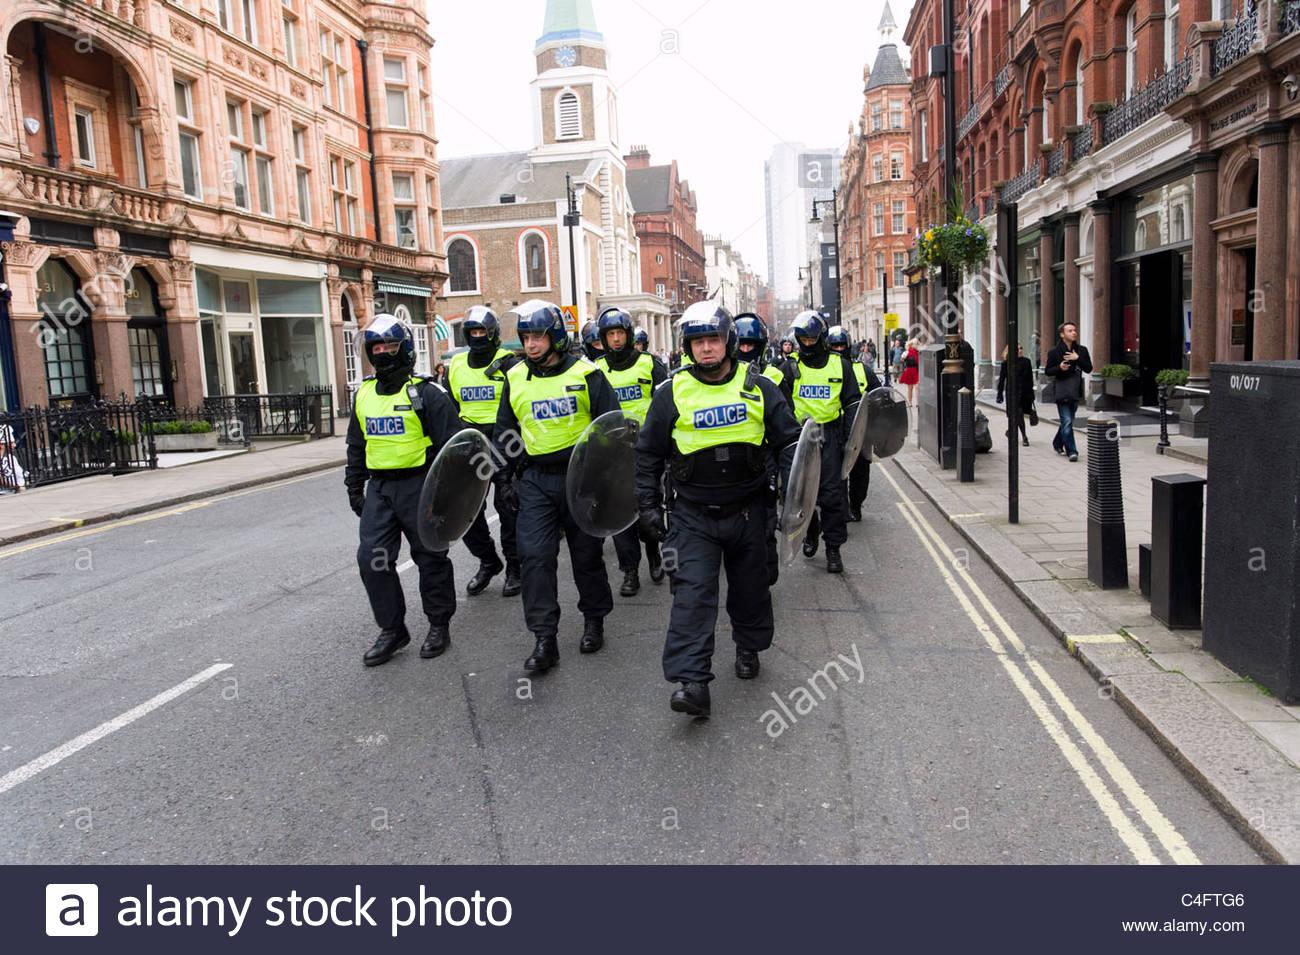 Riot police, London, UK - Stock Image